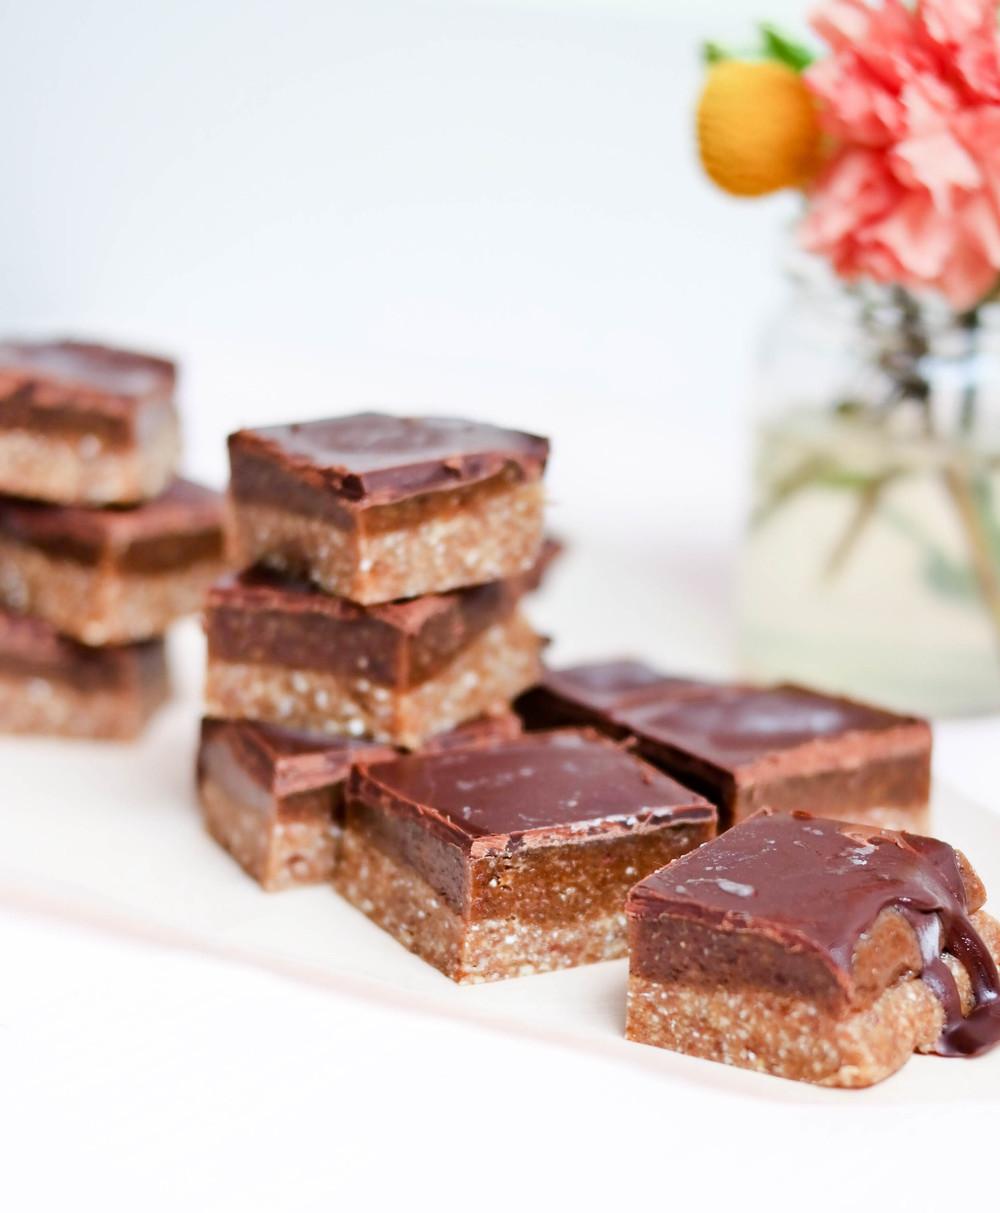 Caramel-andchocolate-chunks | www.8thandlake.com